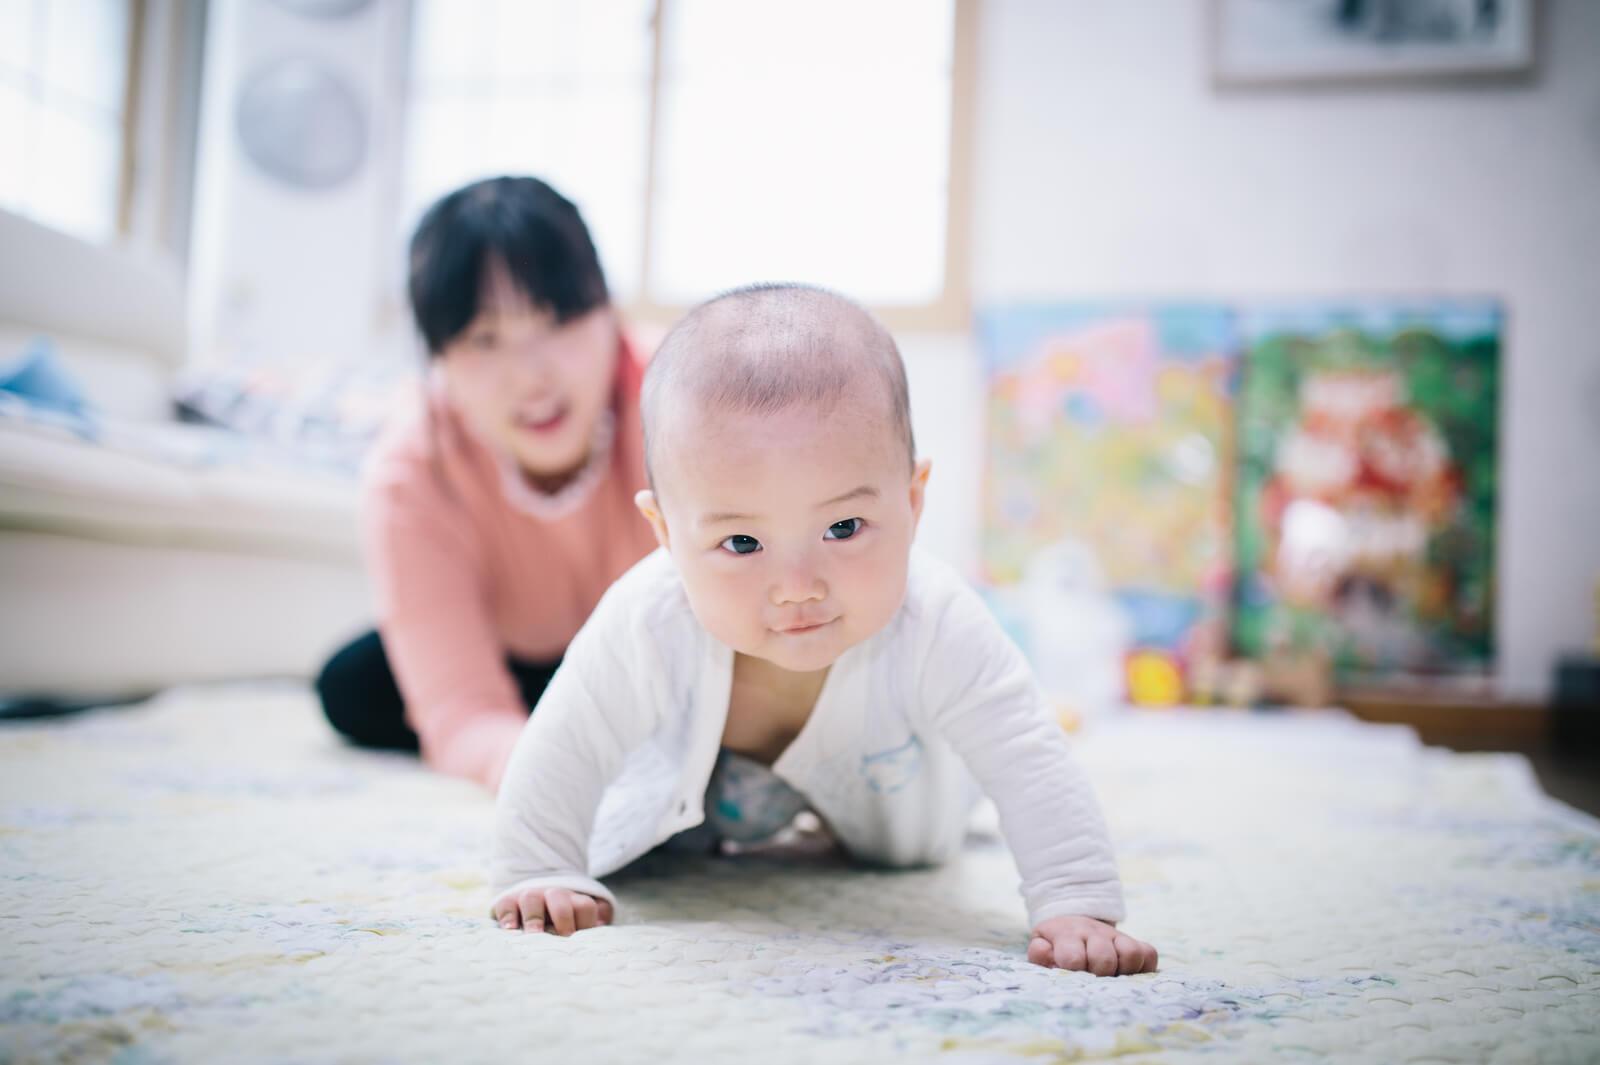 Bedak yang Wanginya Bayi Banget Buat si Kecil yang Aktif